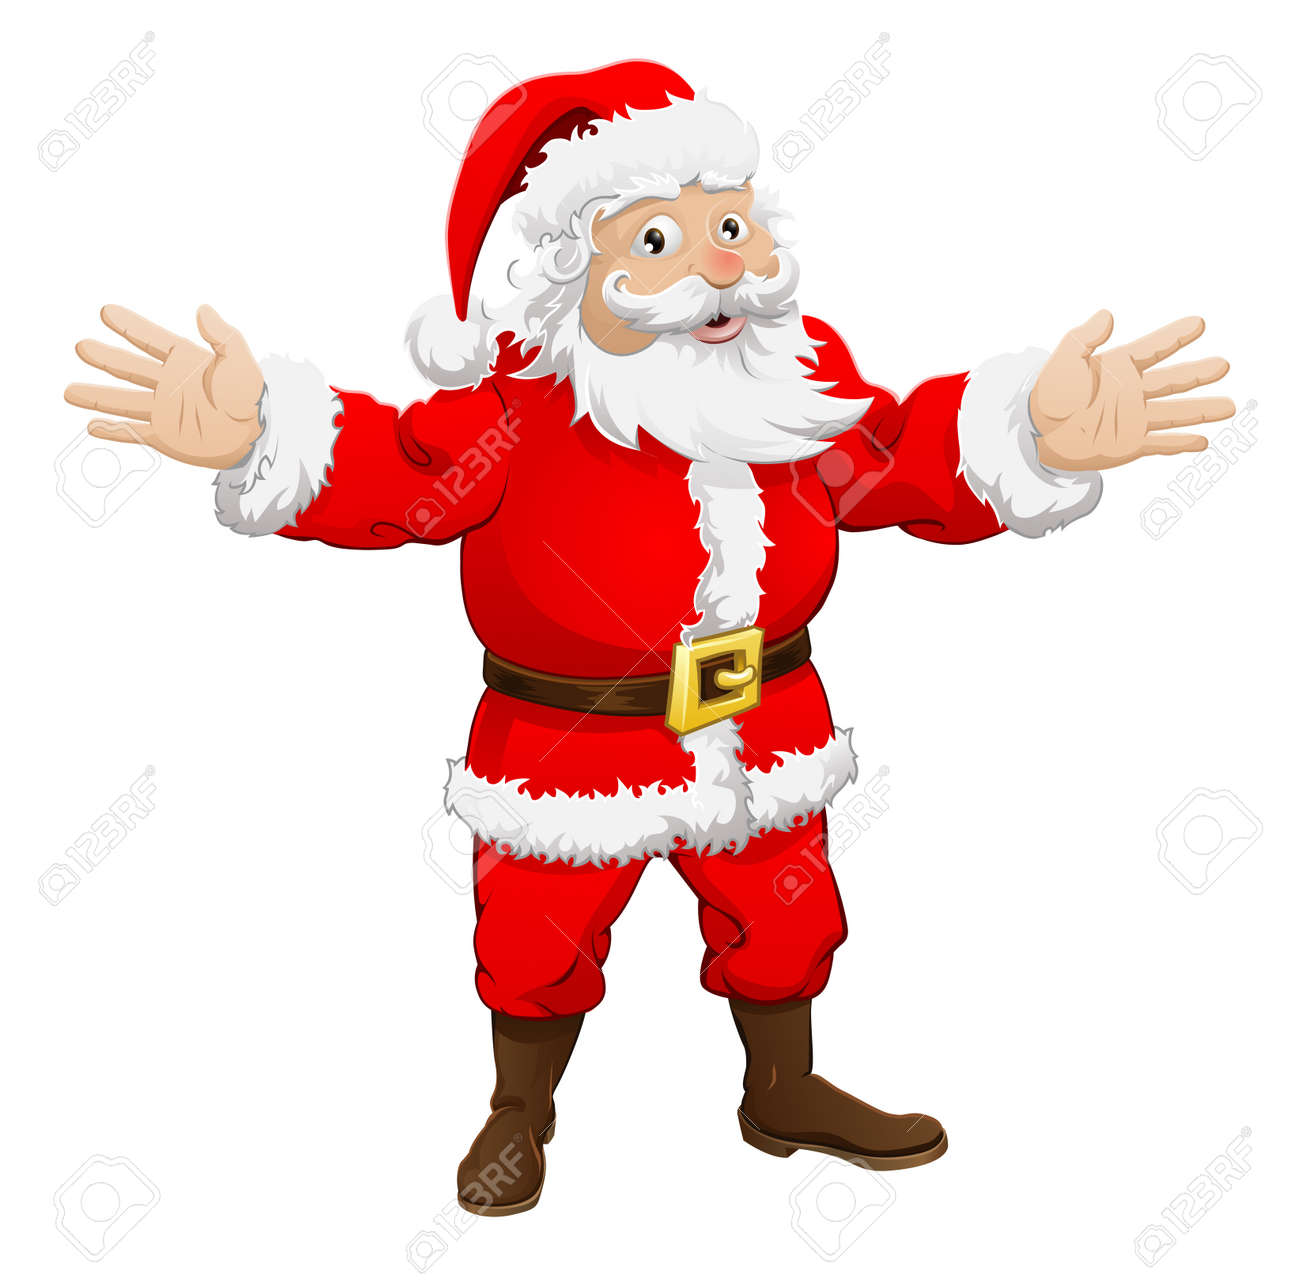 an illustration of a happy christmas santa claus royalty free cliparts vectors and stock illustration image 11272666 an illustration of a happy christmas santa claus